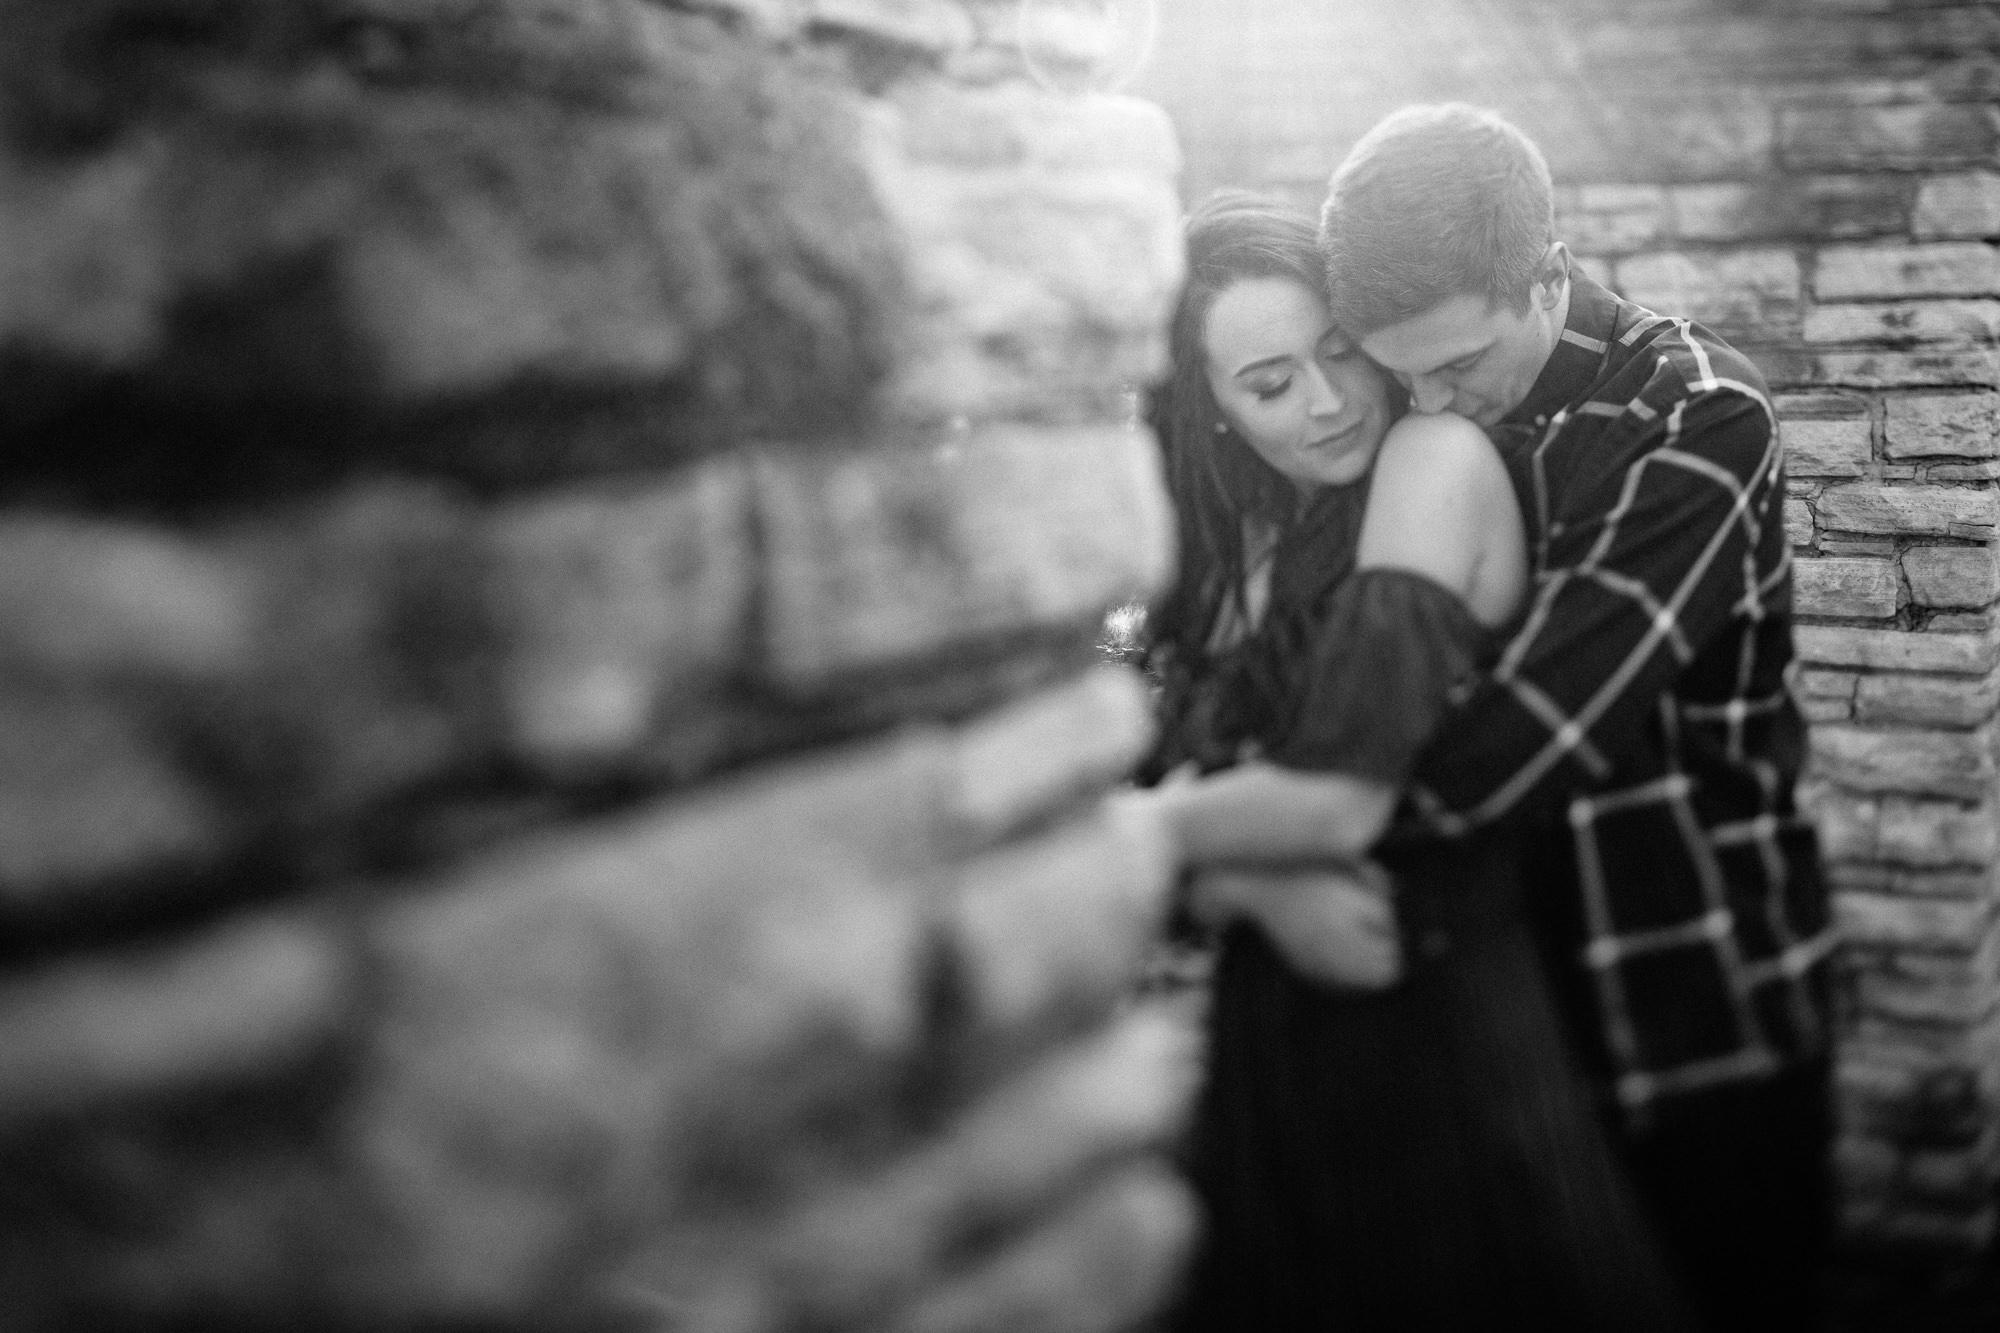 wedding-elopement-adventerous-romantic-timeless-des-moines-siouxfalls-photography-16.jpg